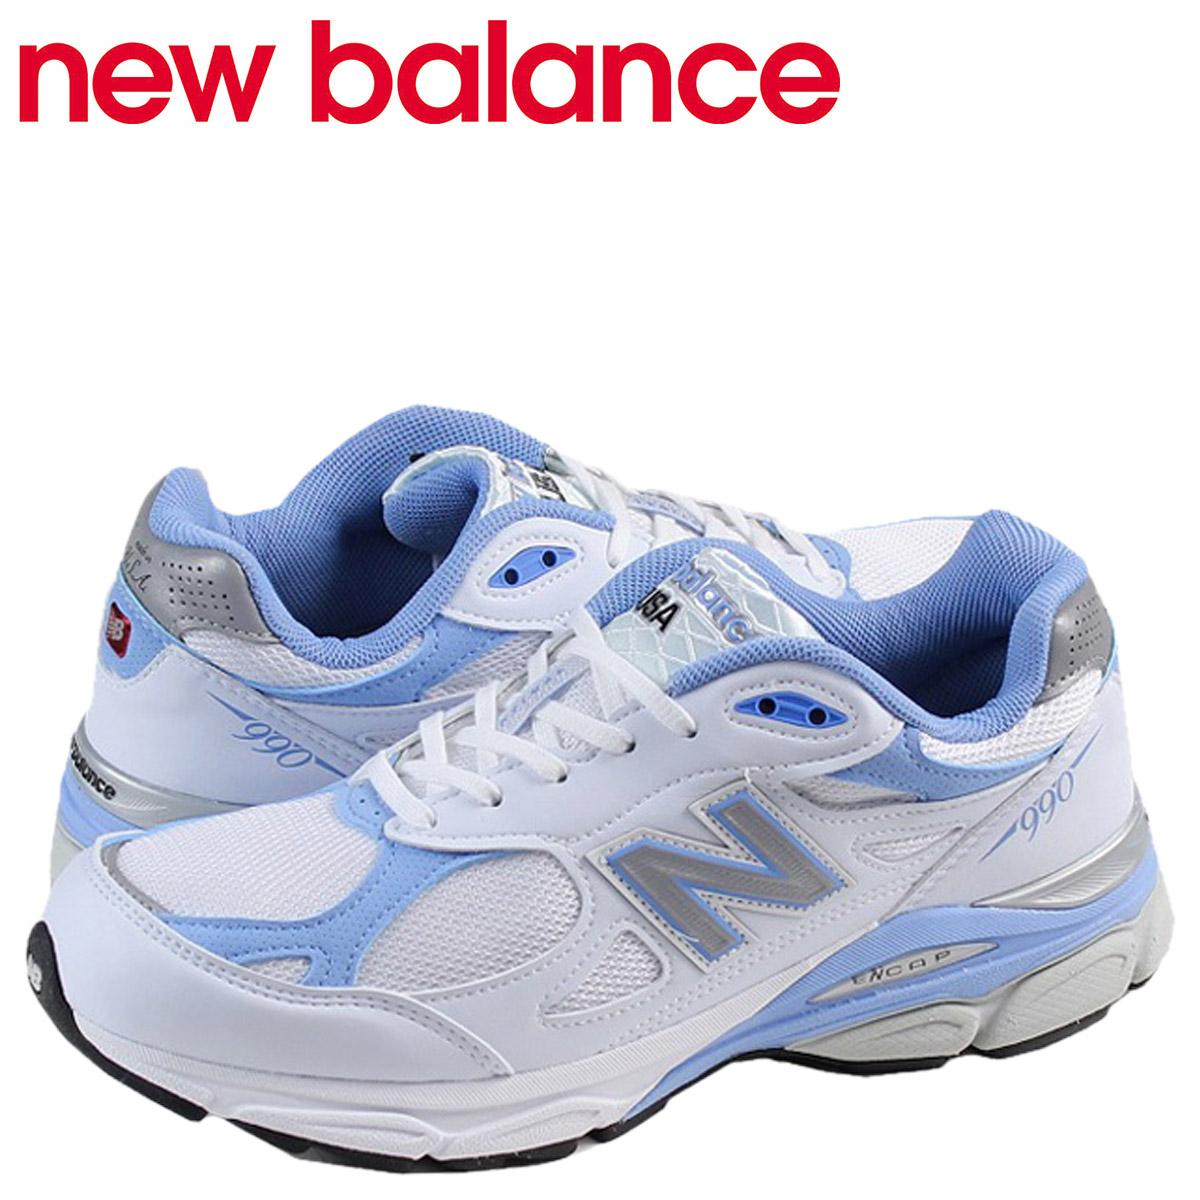 New W990wb3 Online Balance Sugar Lady's Sneakers Shop w7BaxEq7OZ